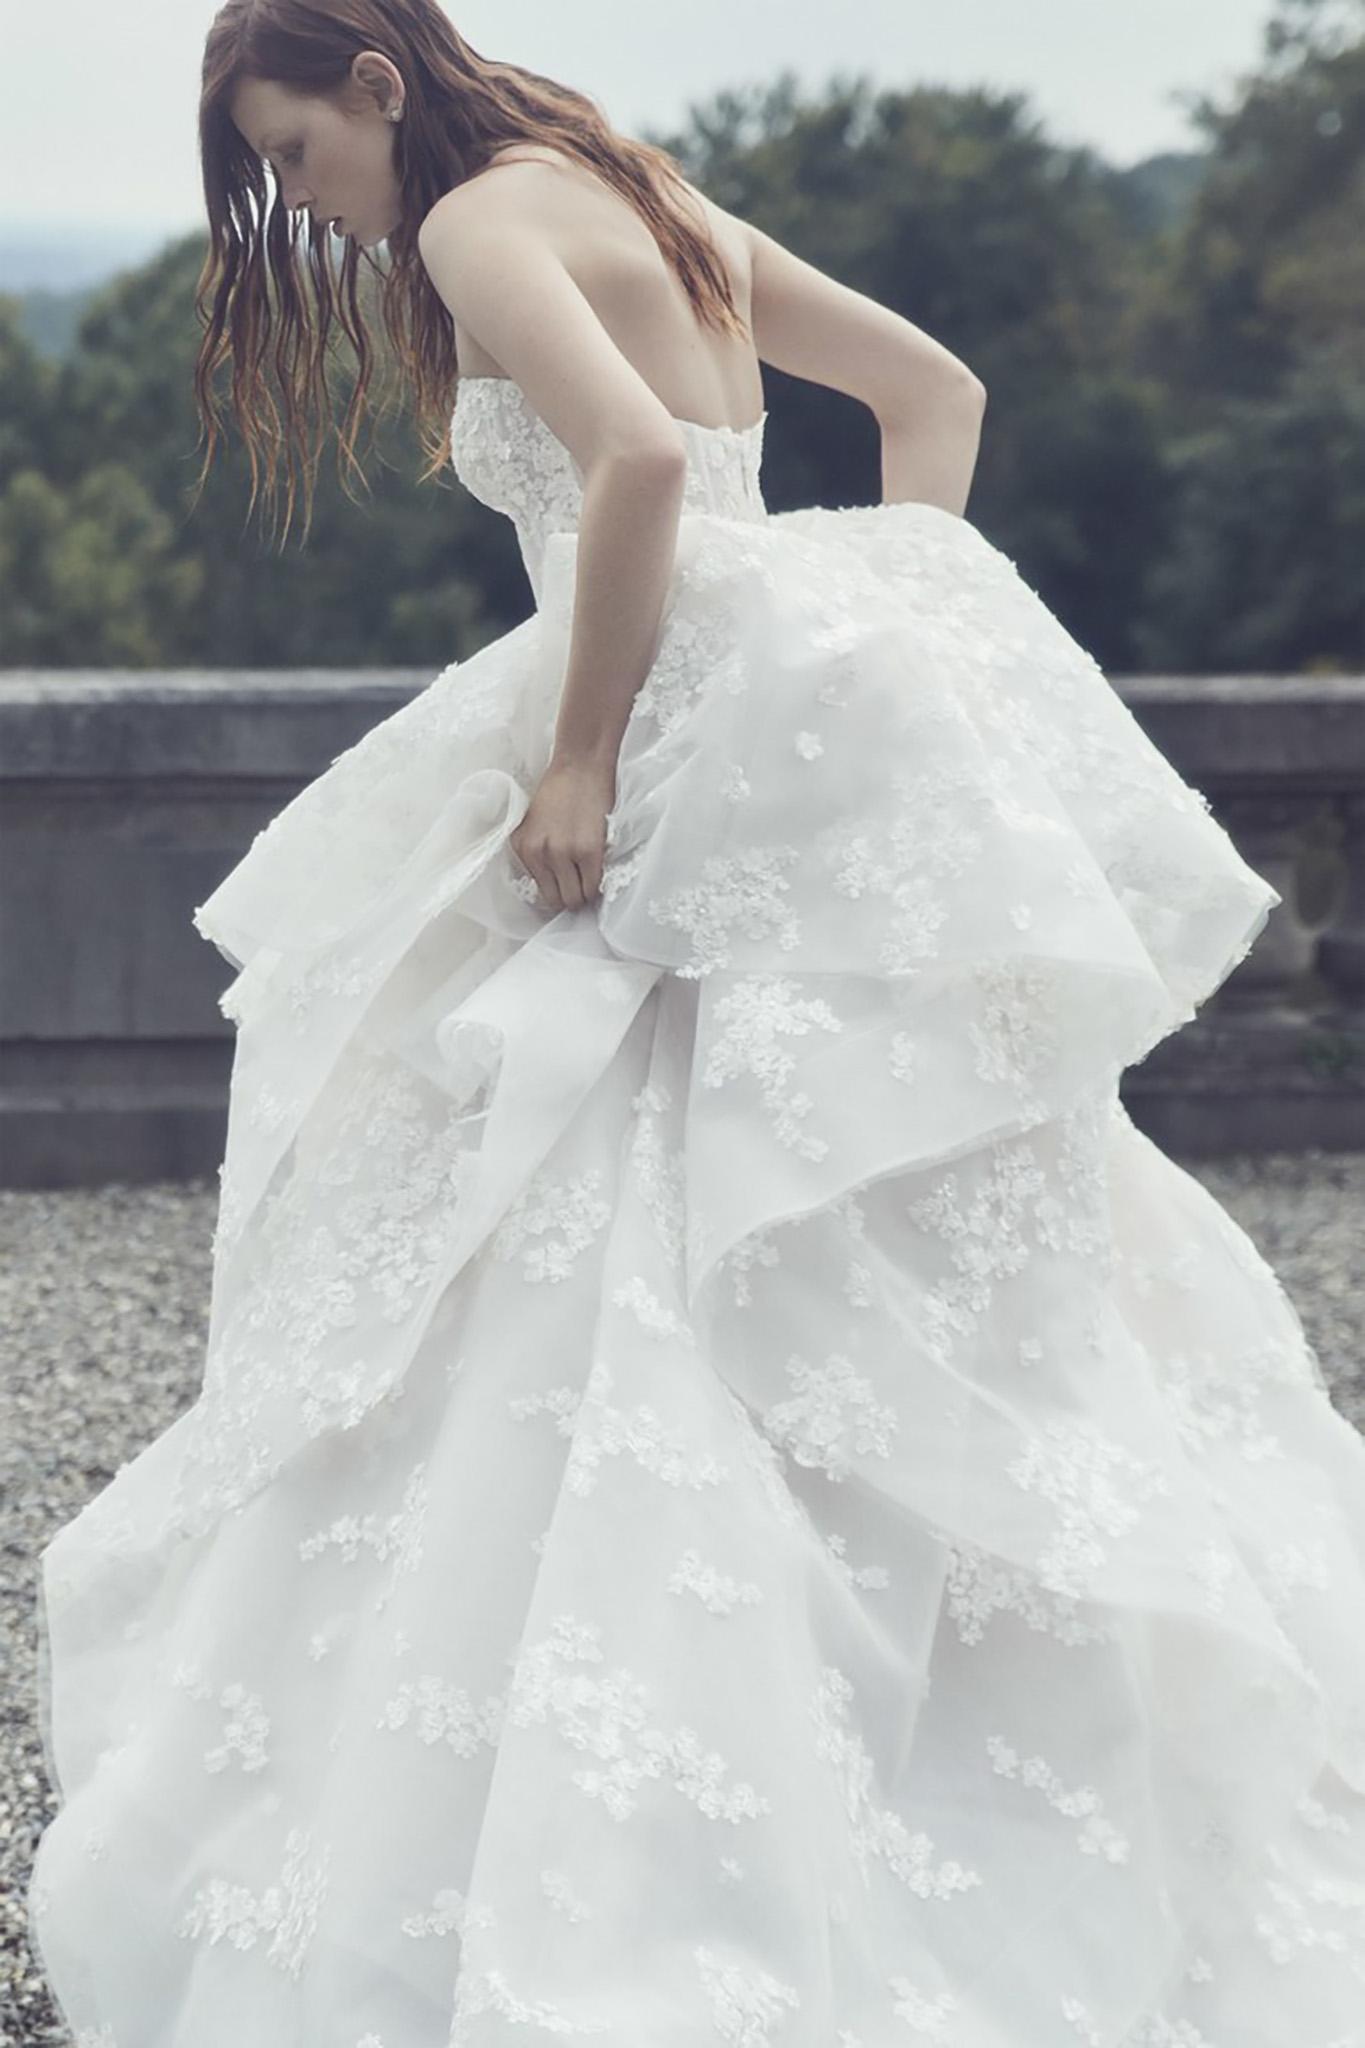 65f1d5007 Monique Lhuillier Everest wedding dress